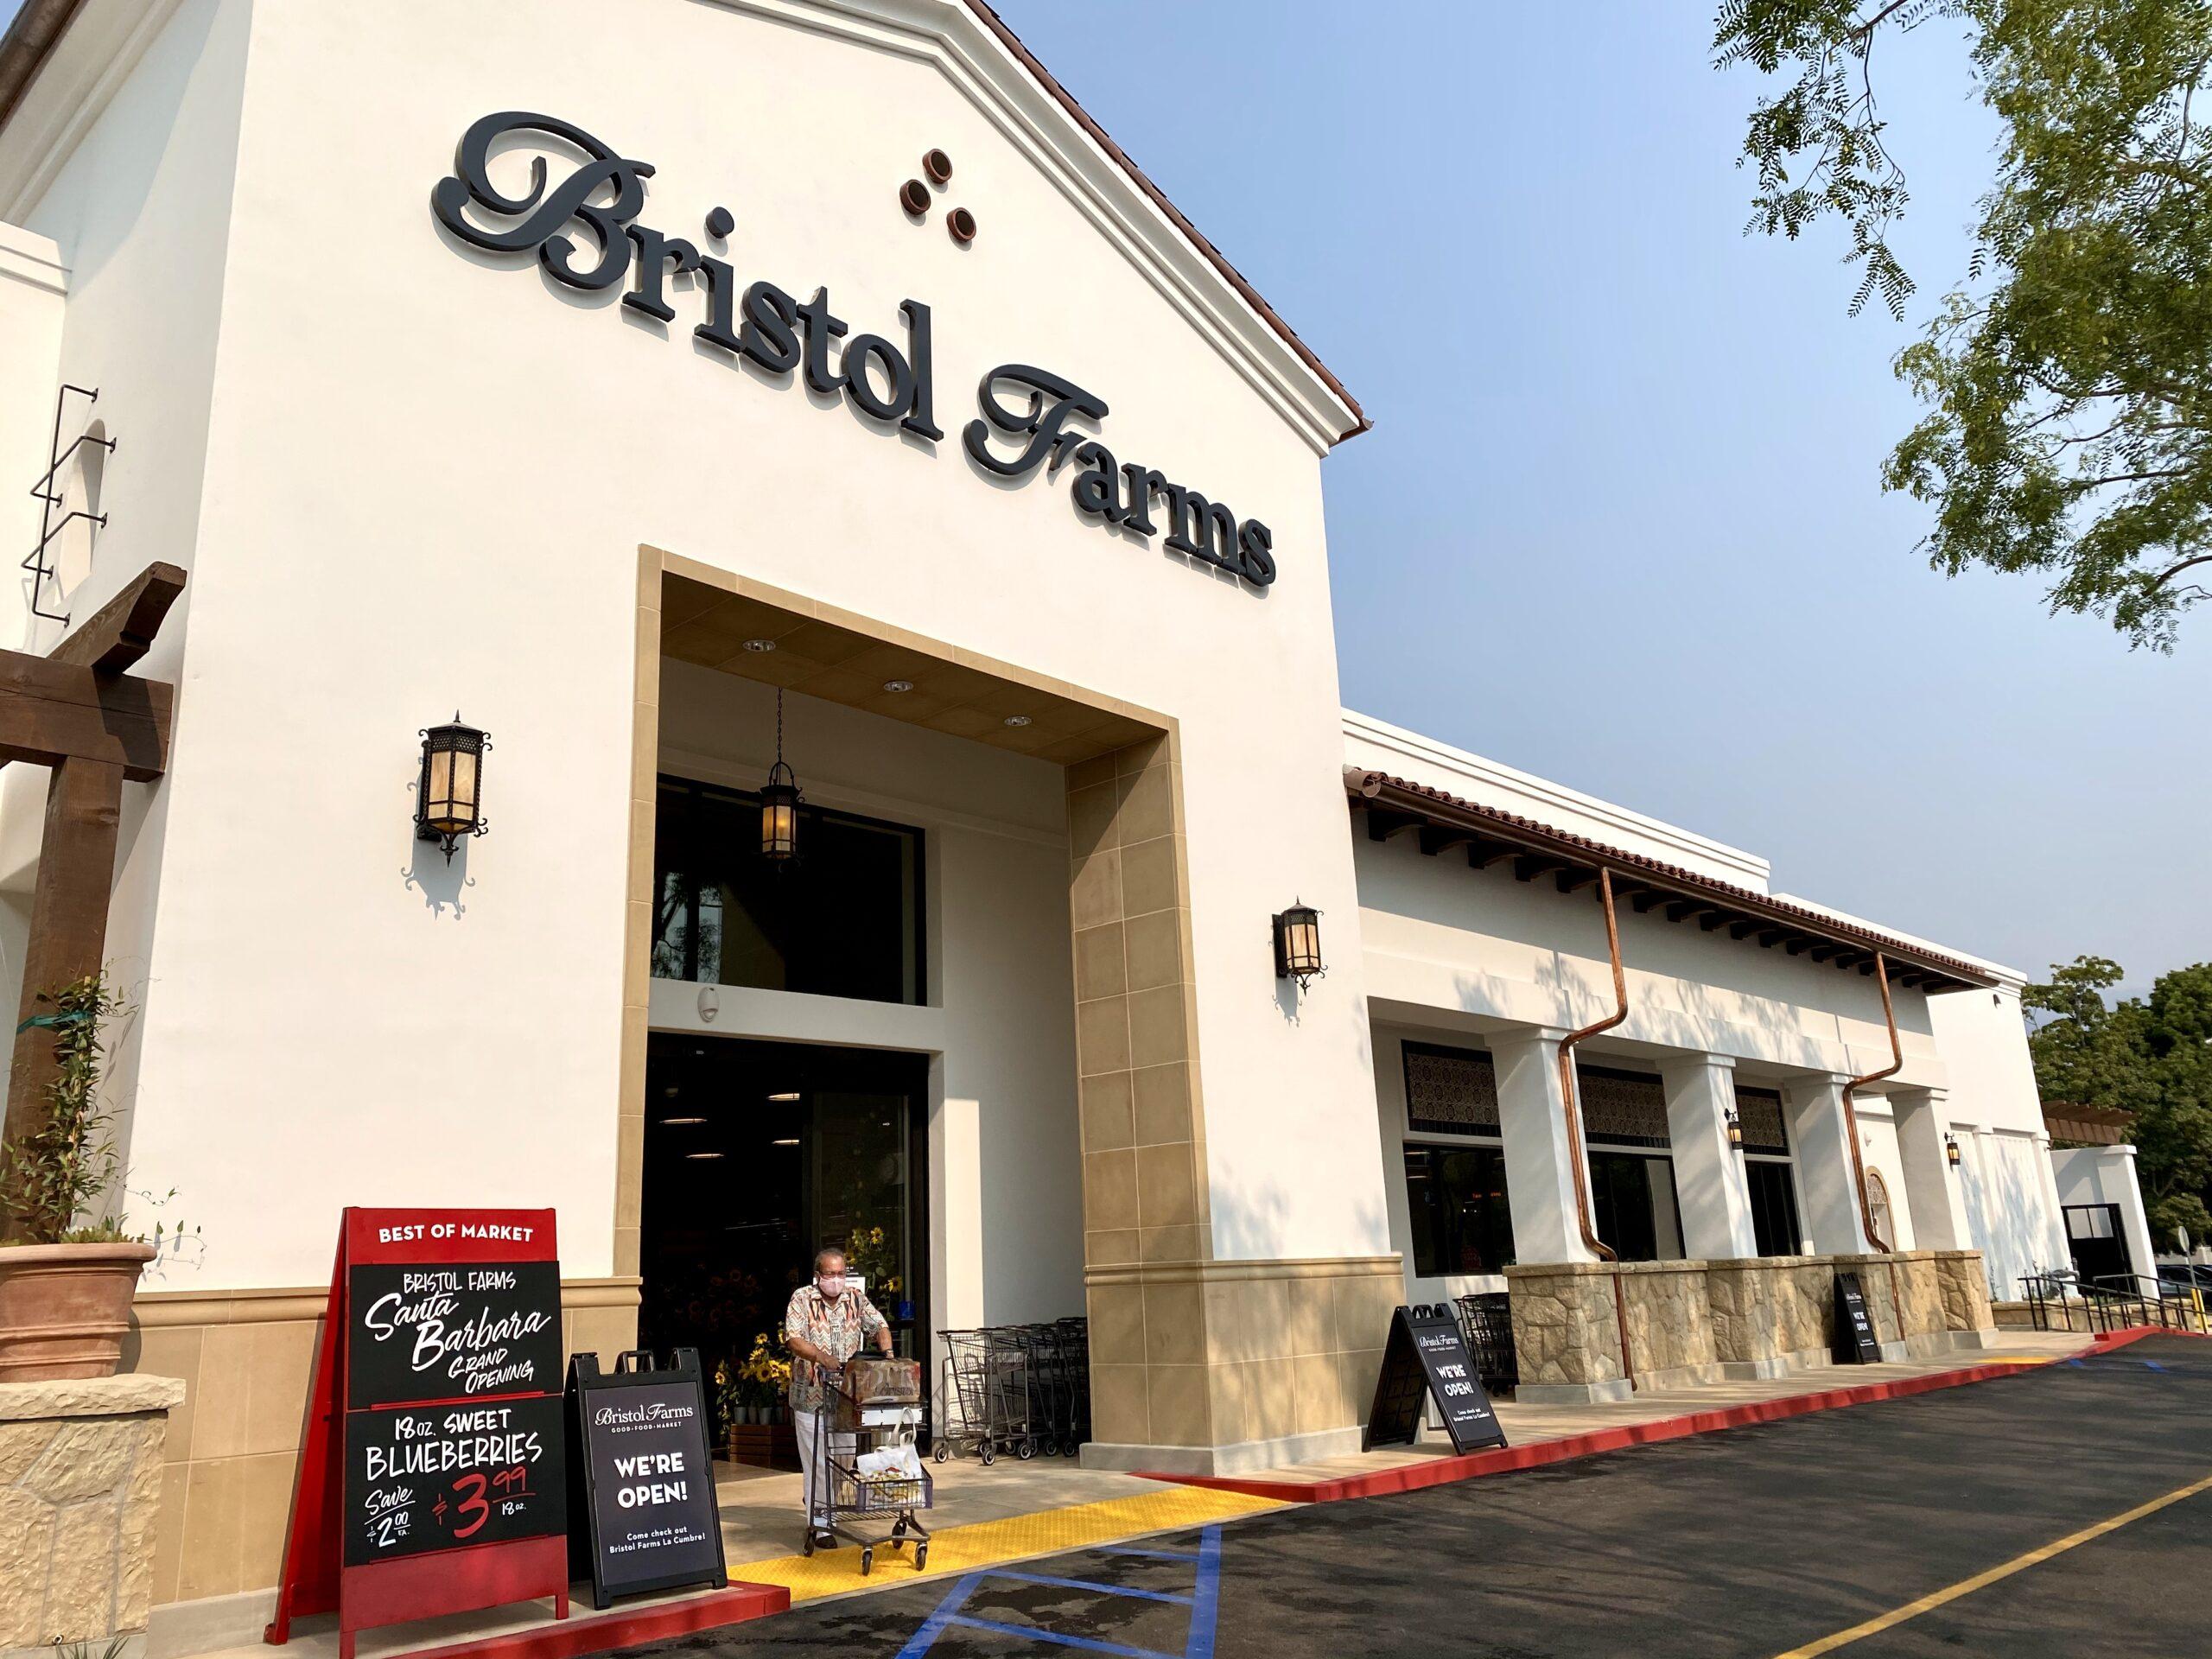 Bristol Farms Debuts New Store In Santa Barbara In San Diego Belly Up 2021 Calander